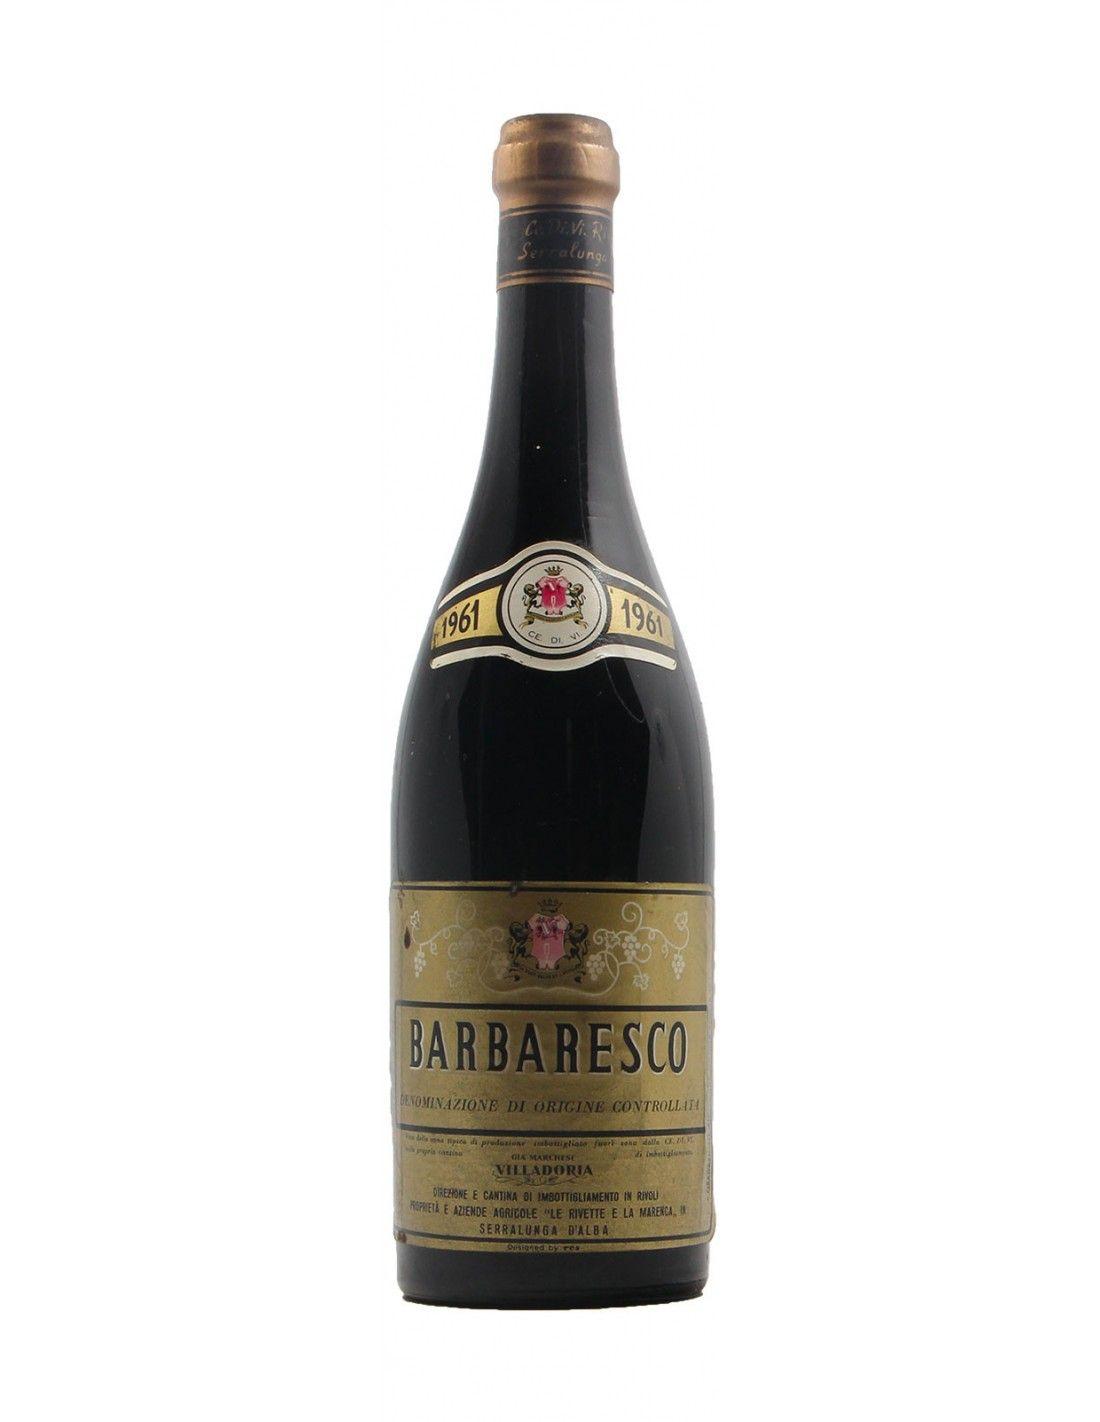 BARBARESCO 1961 VILLADORIA Grandi Bottiglie